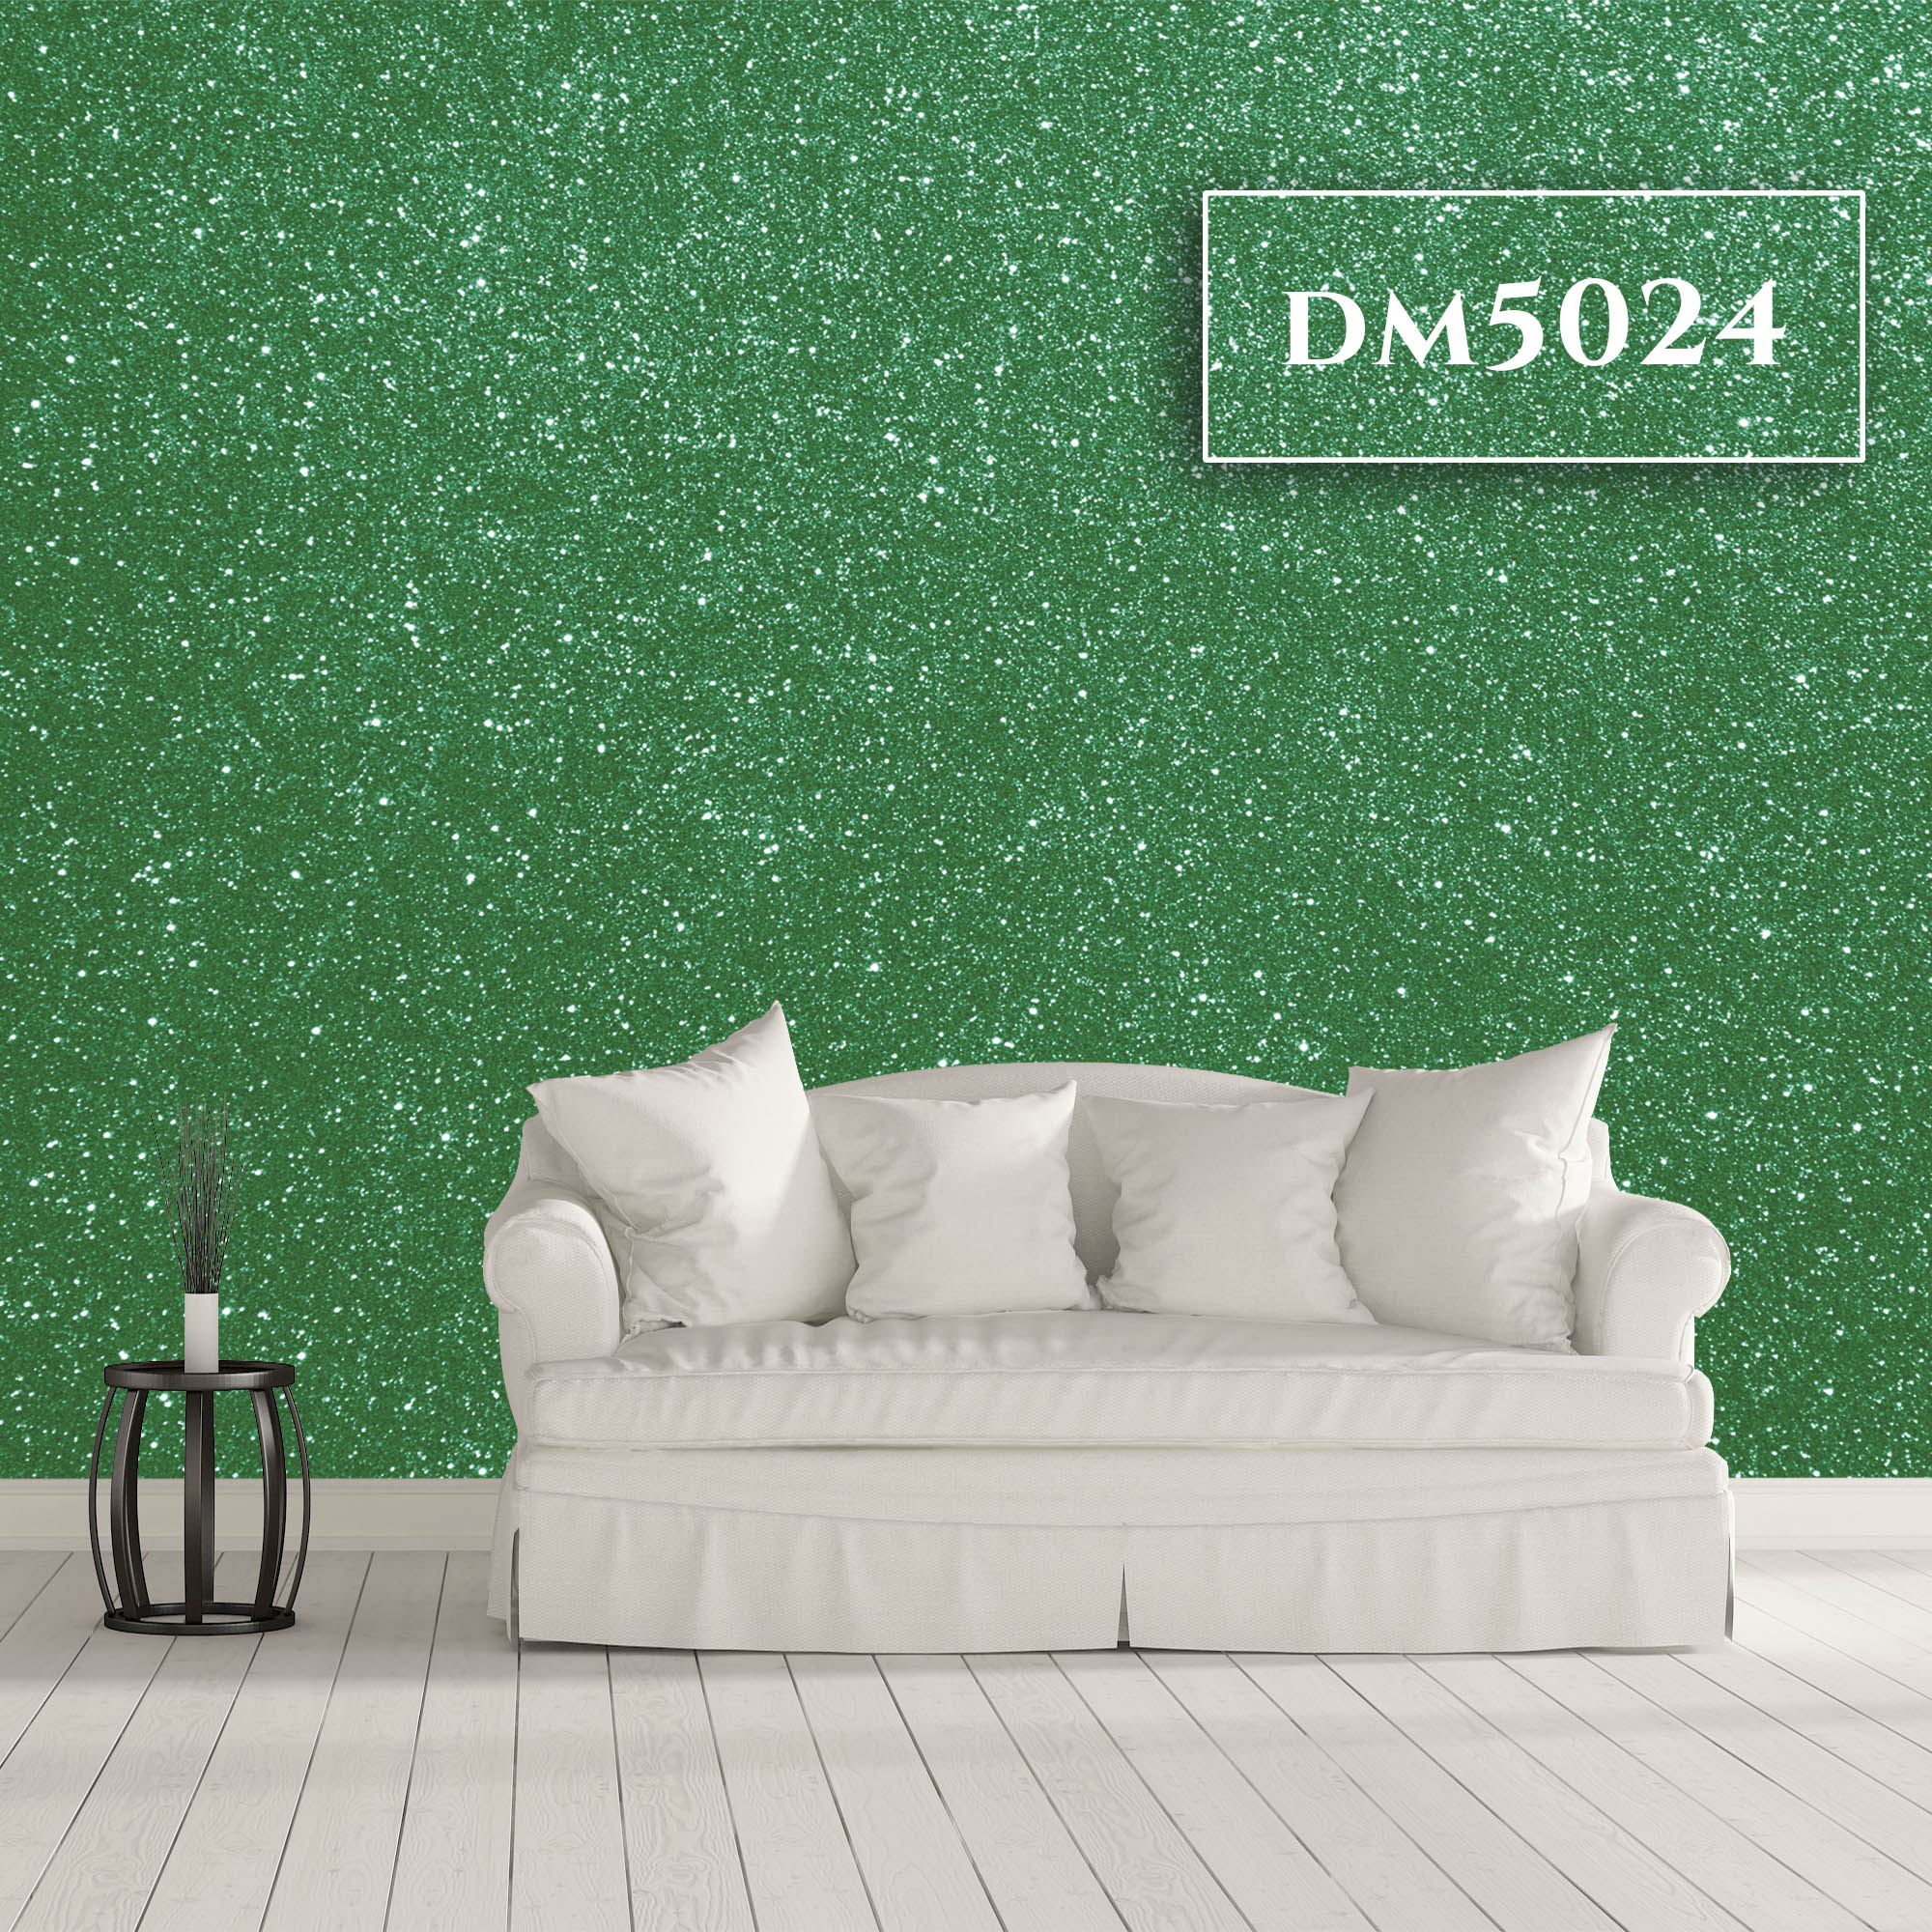 DM5024